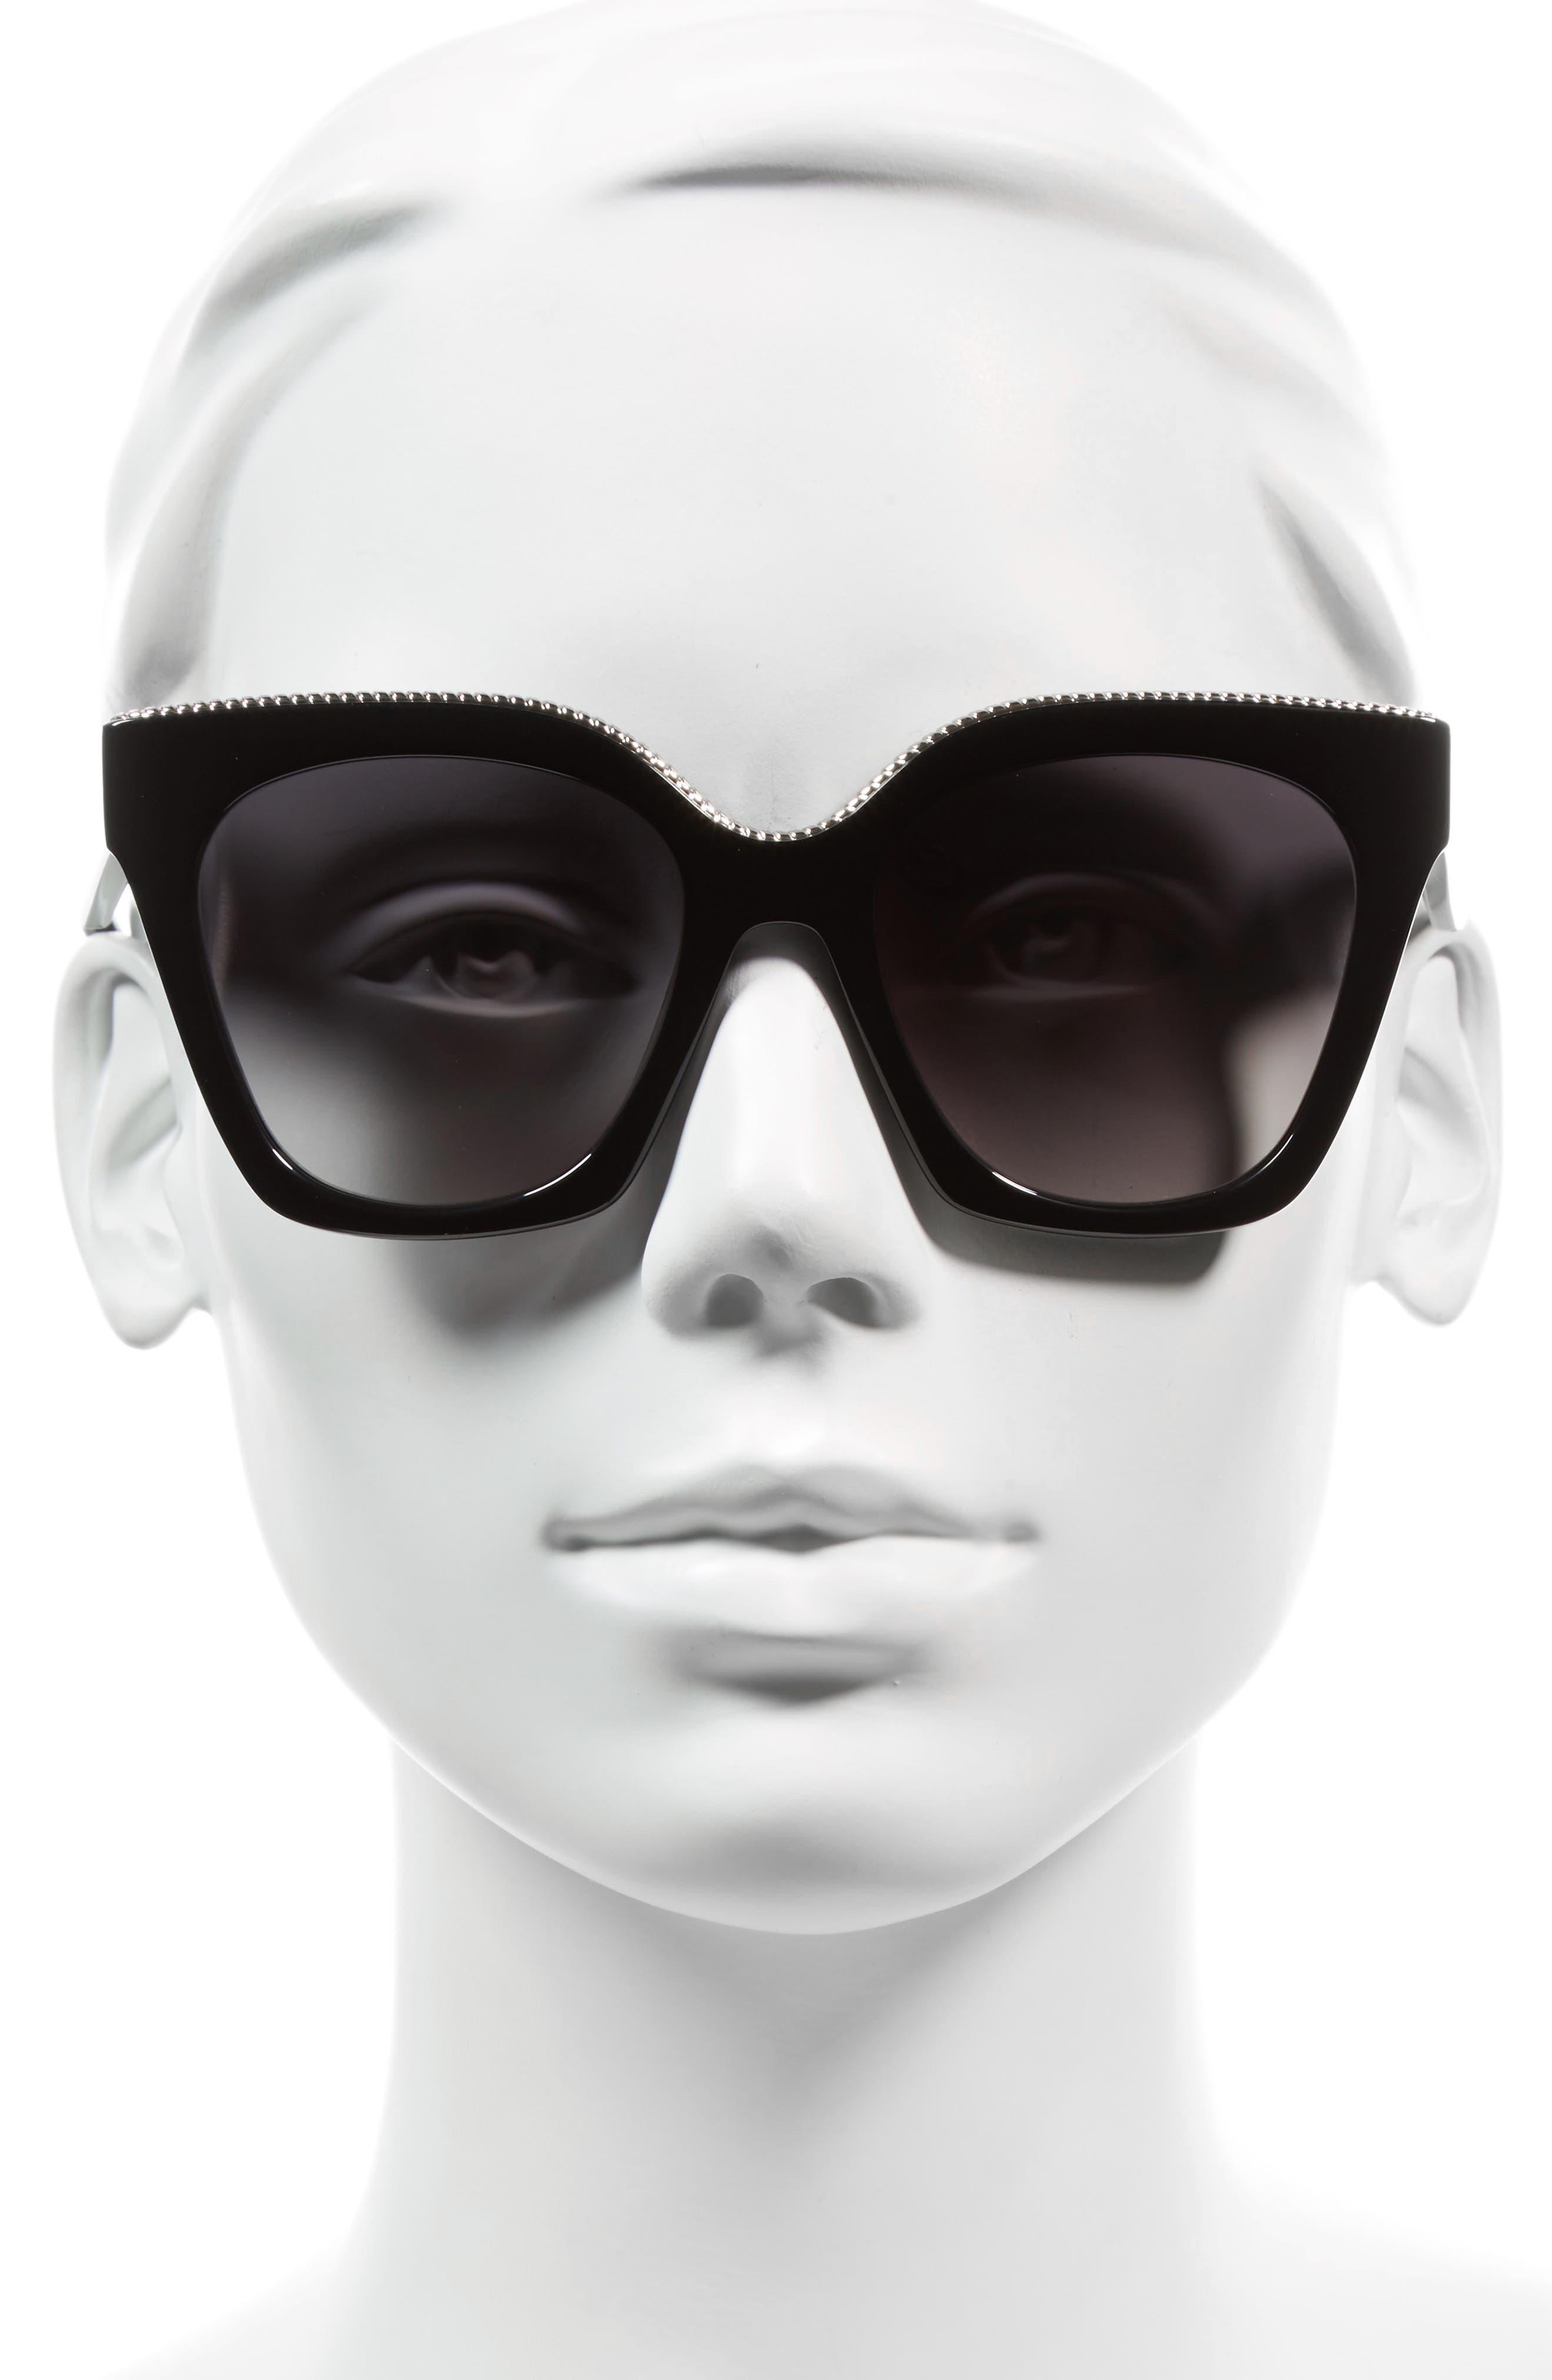 52mm Square Sunglasses,                             Alternate thumbnail 2, color,                             001